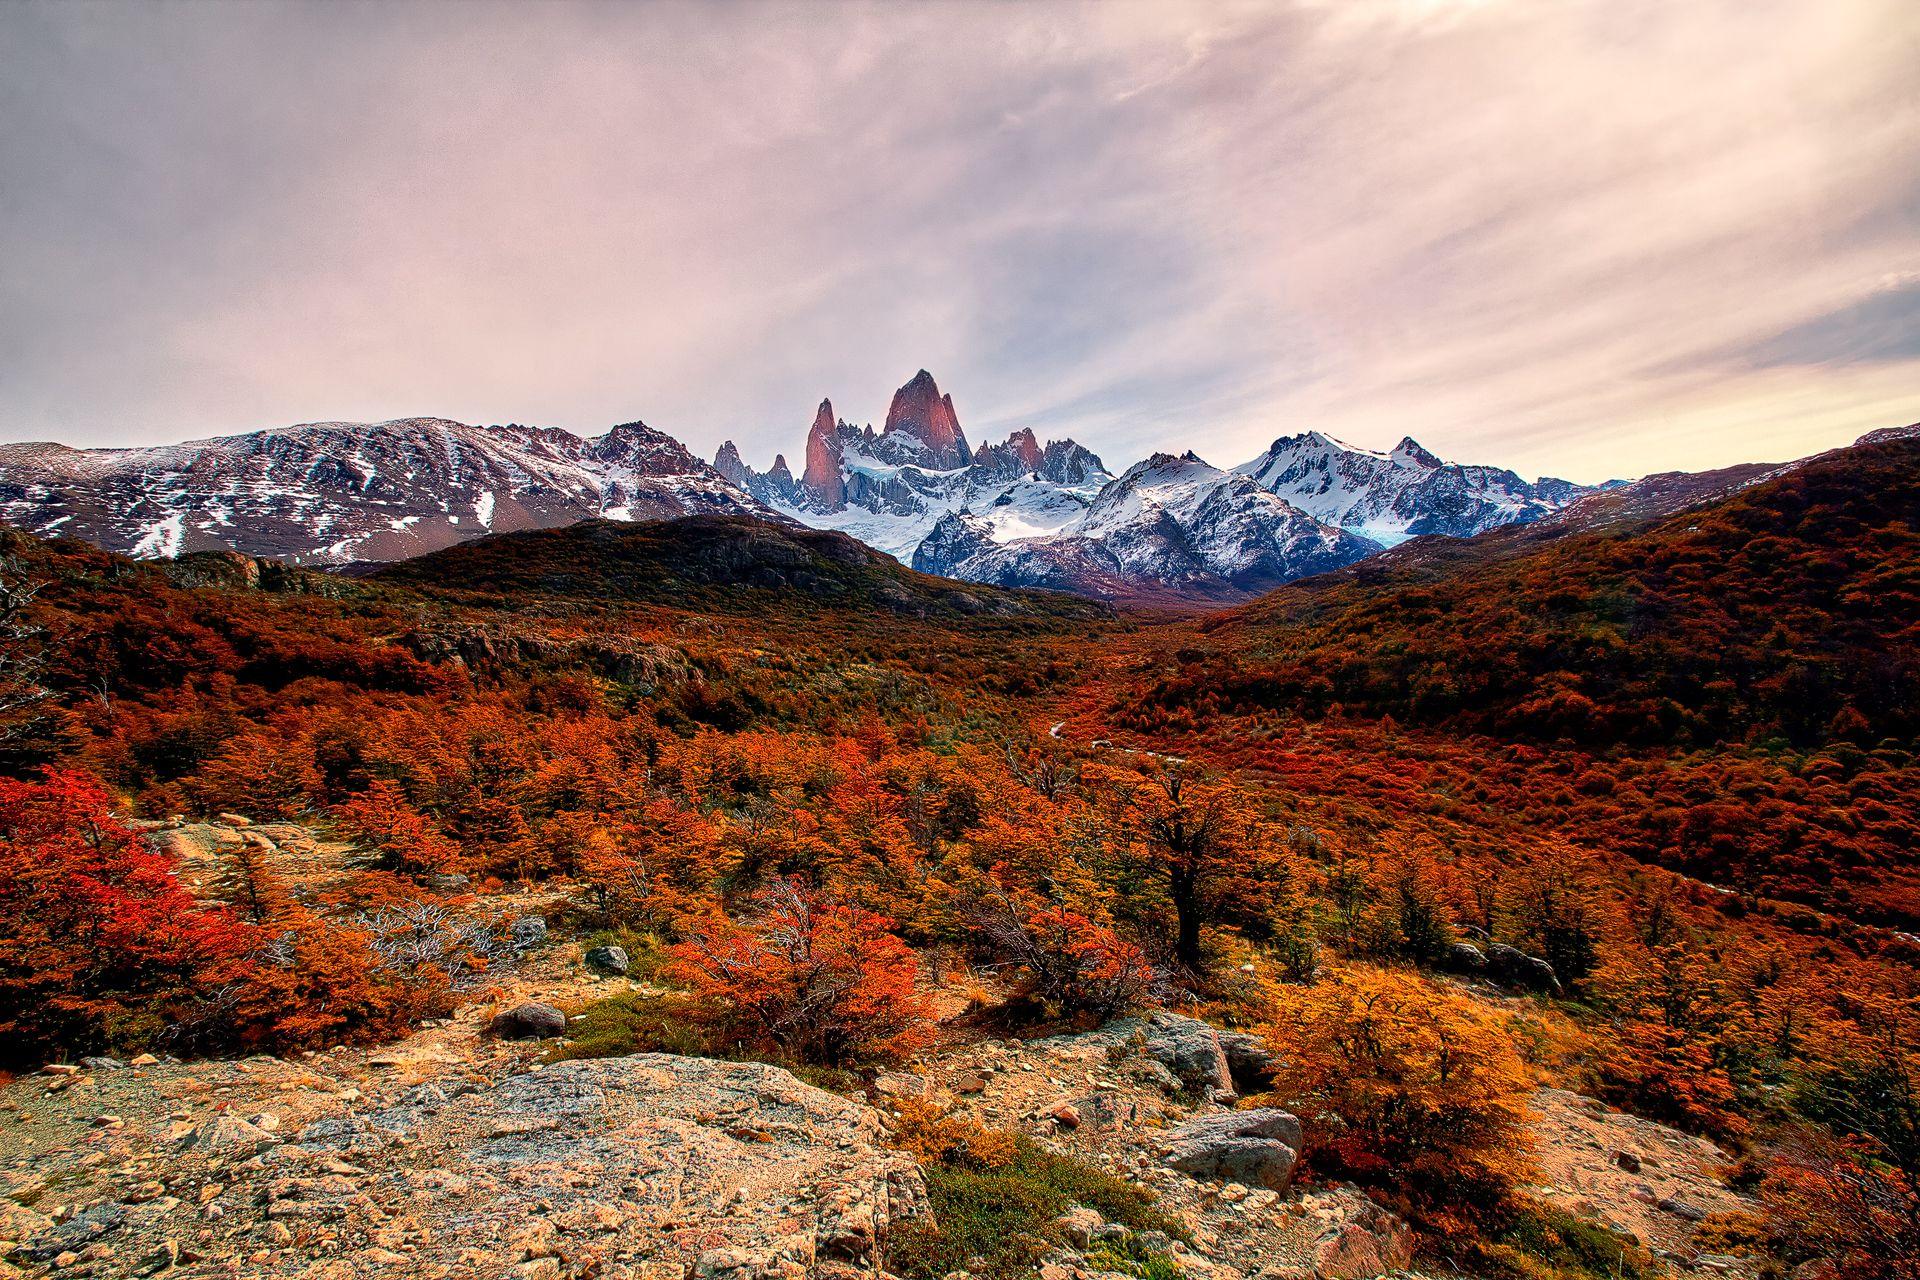 Autumn Colors, Mount Fitz Roy, el chalten, Los Glaciares National Park, Patagonia, Argentina / Chile, andes, earthporn, landscape